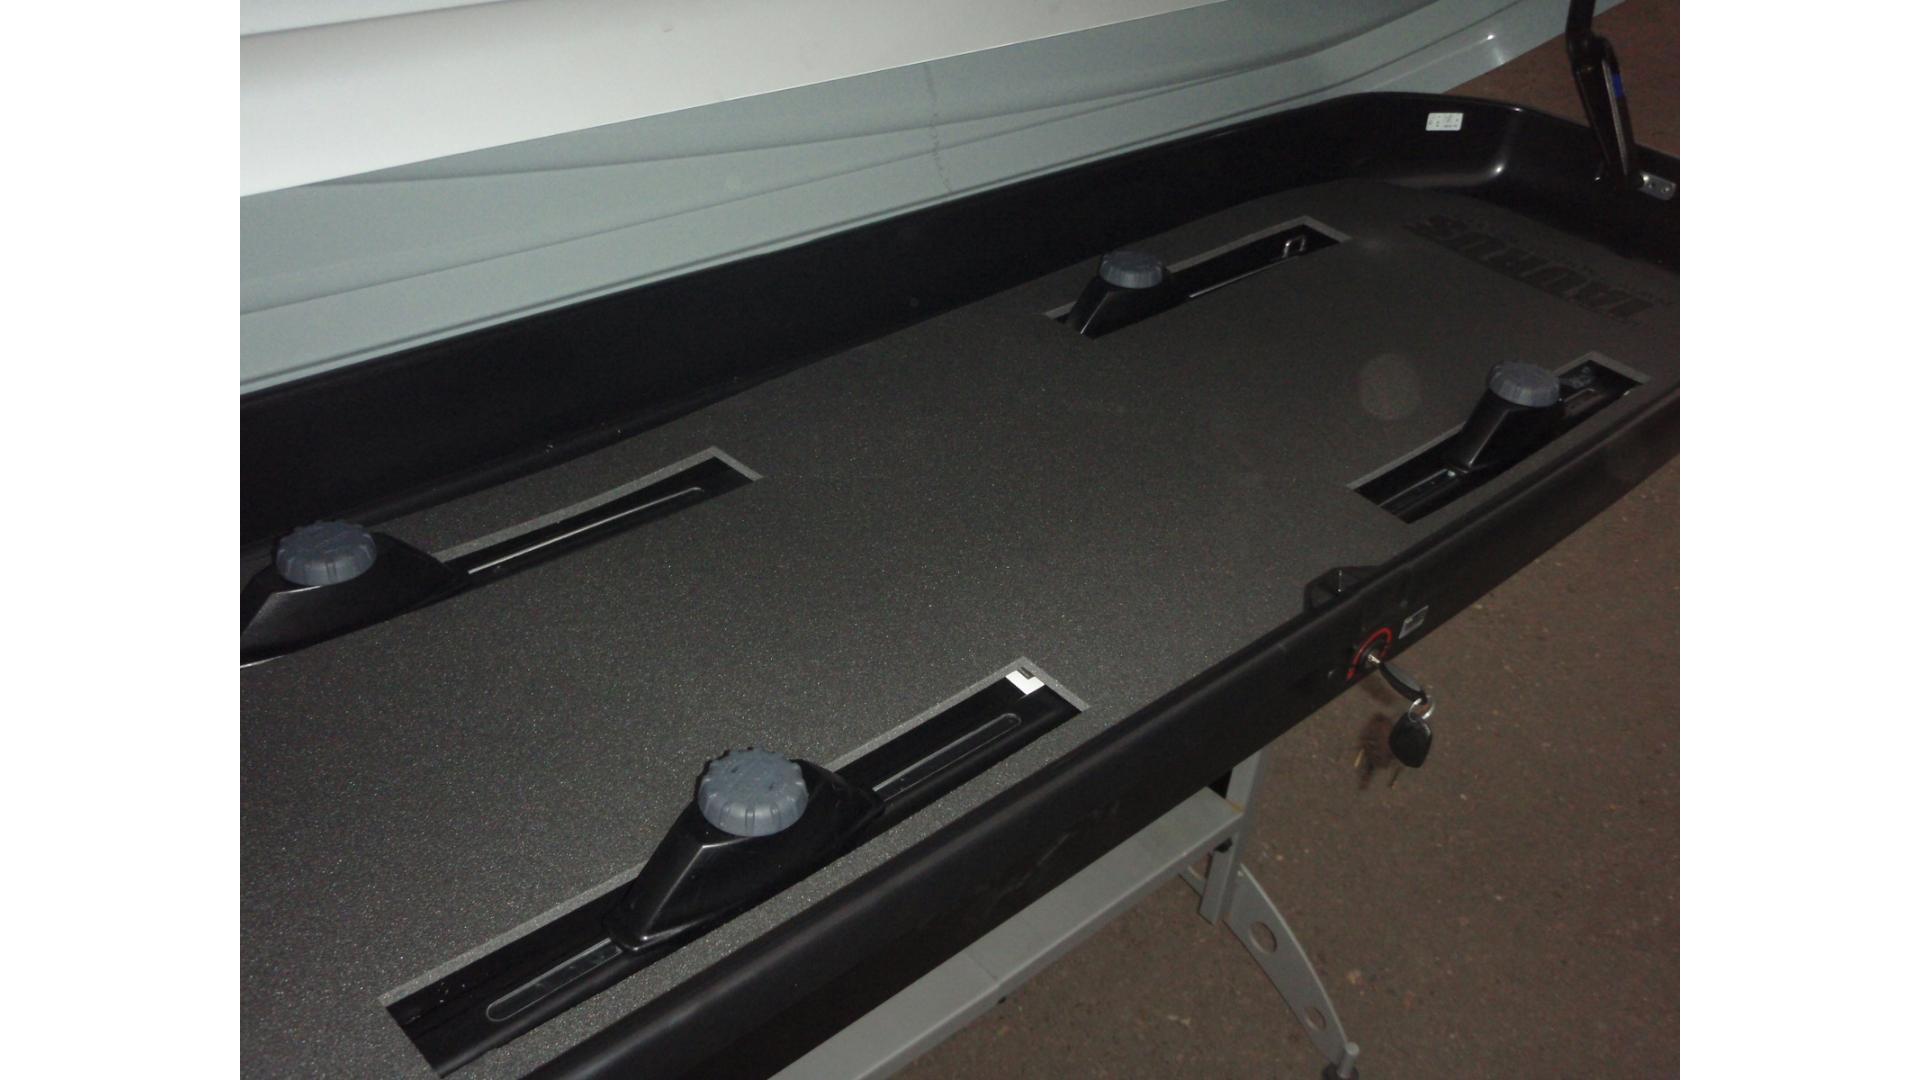 Taurus ochranná vložka do boxu  A 900  (205x72 cm)